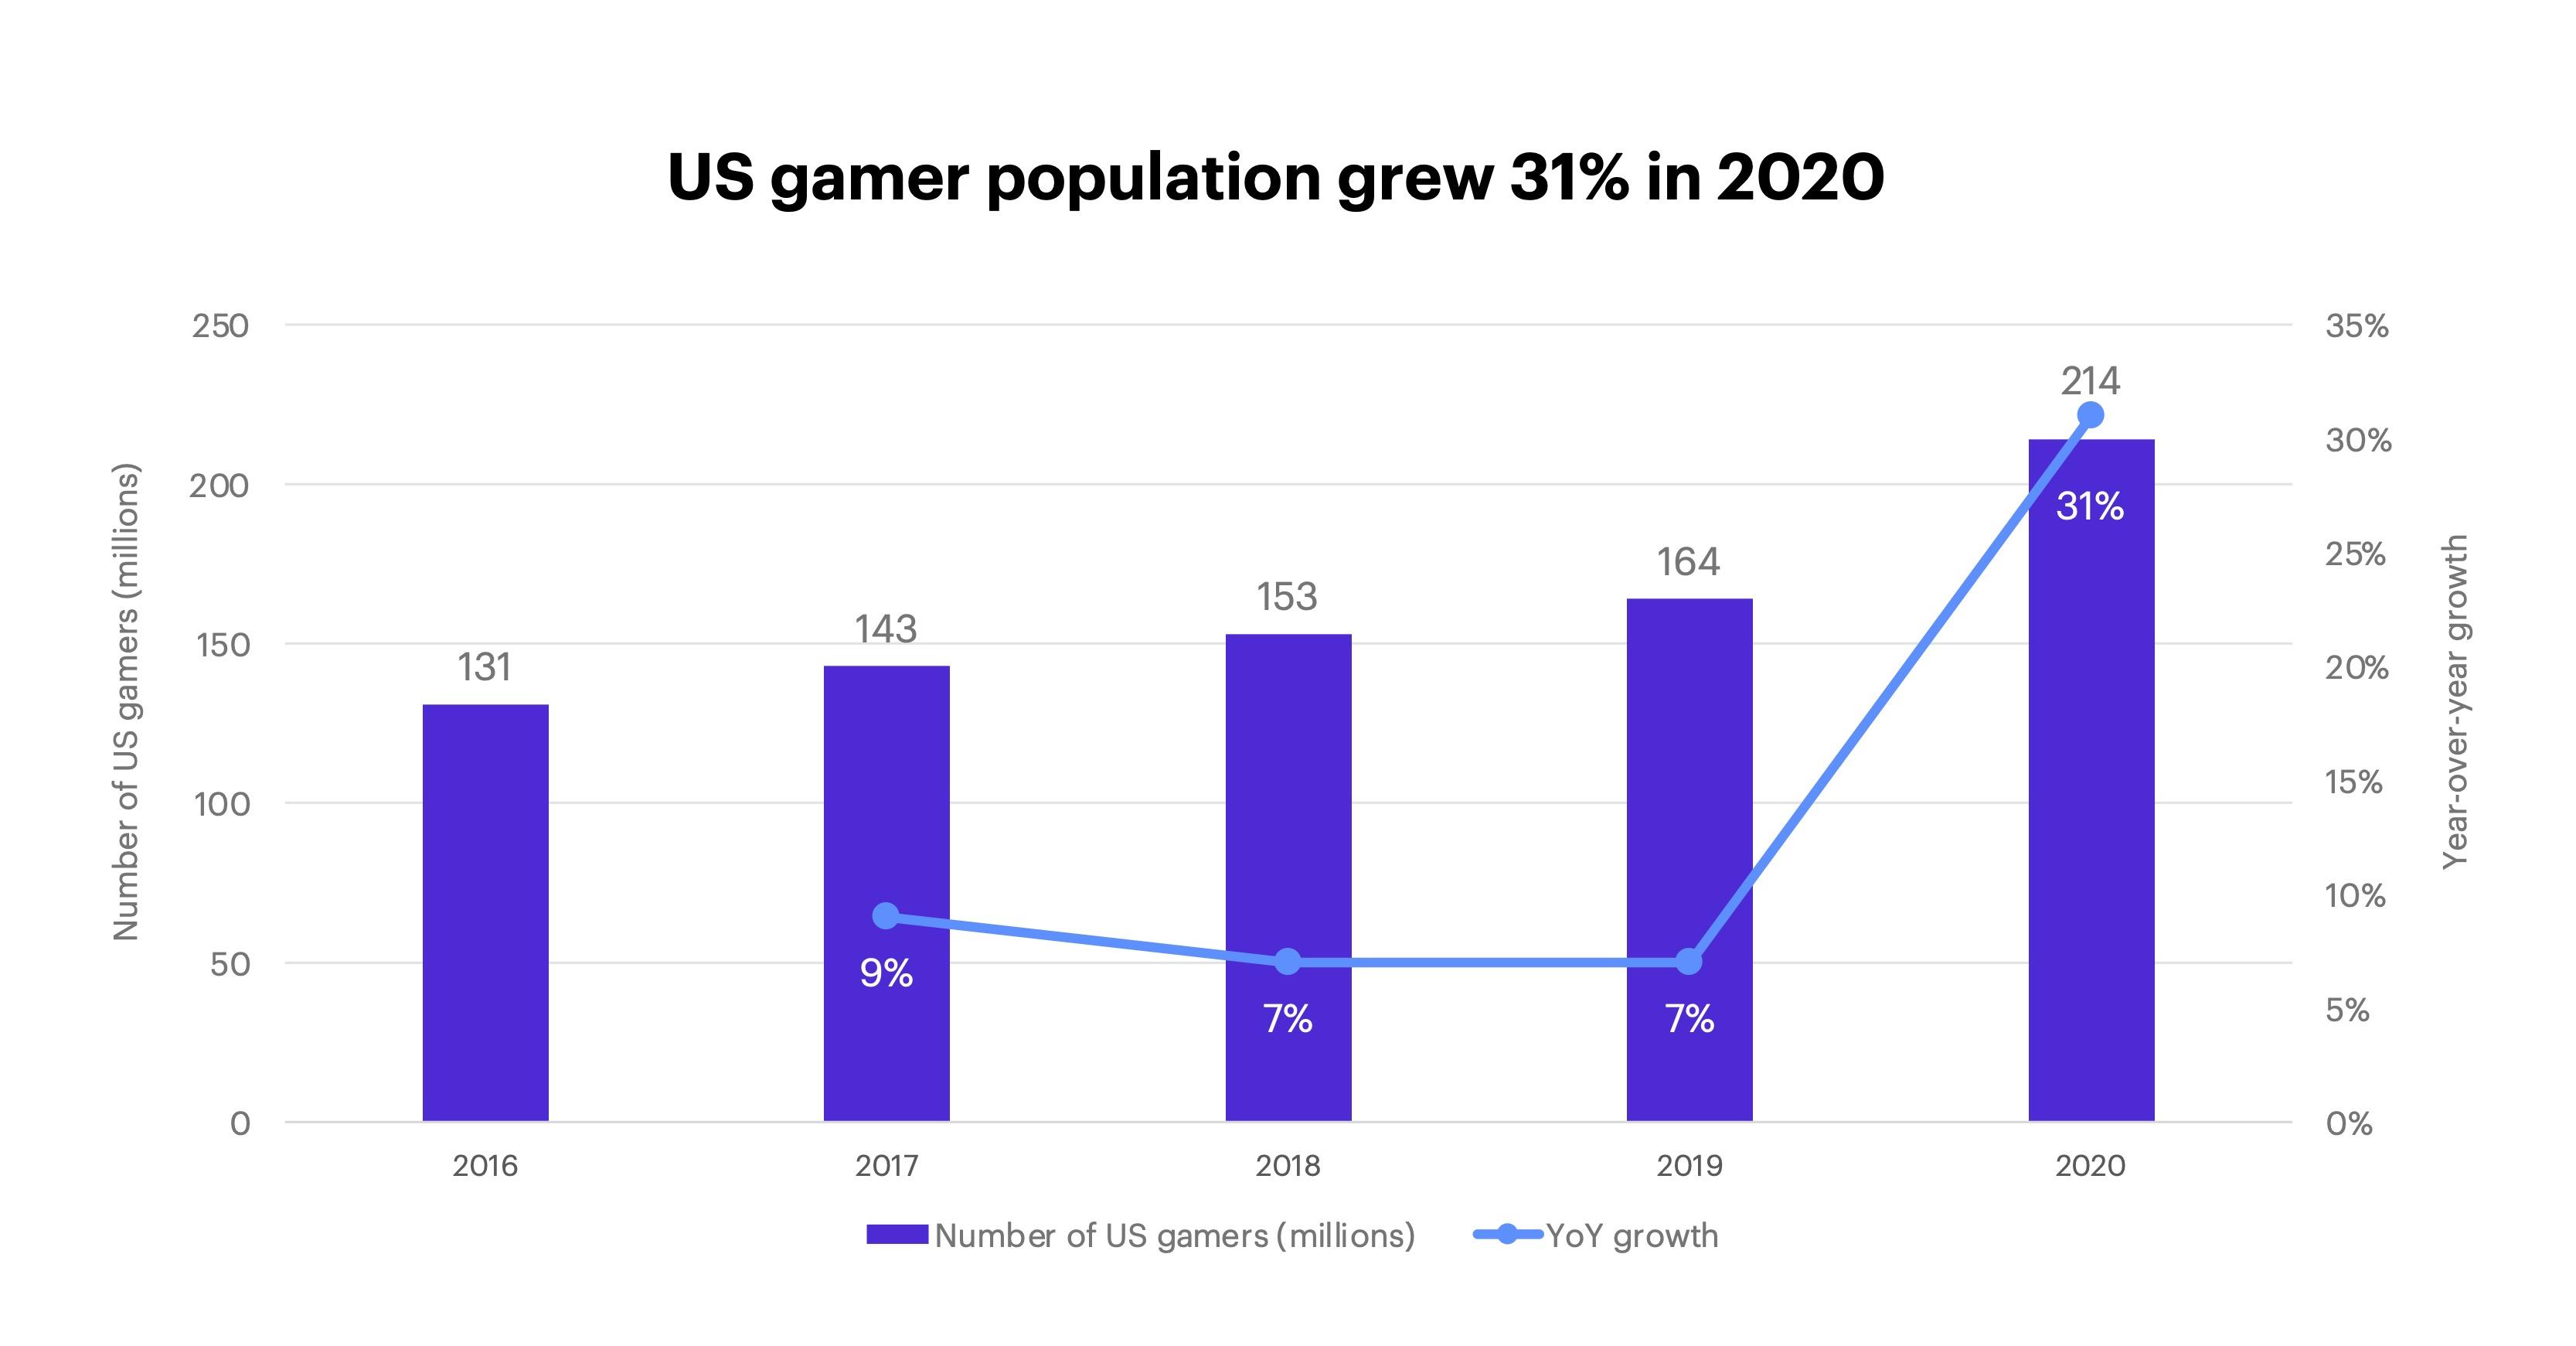 US gamer population grew 31% in 2020